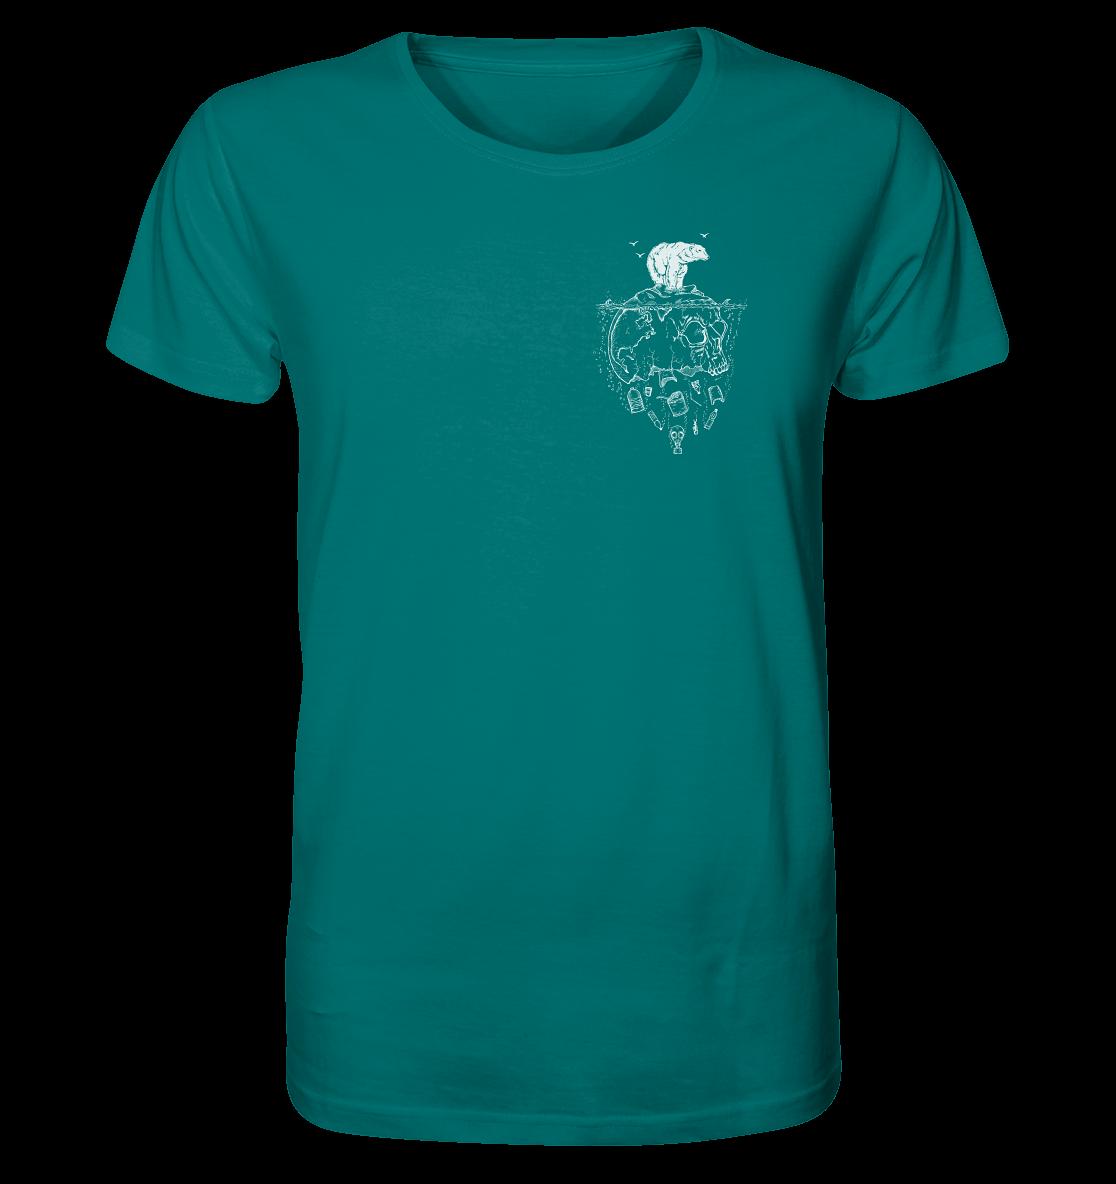 front-organic-shirt-007373-1116x-33.png